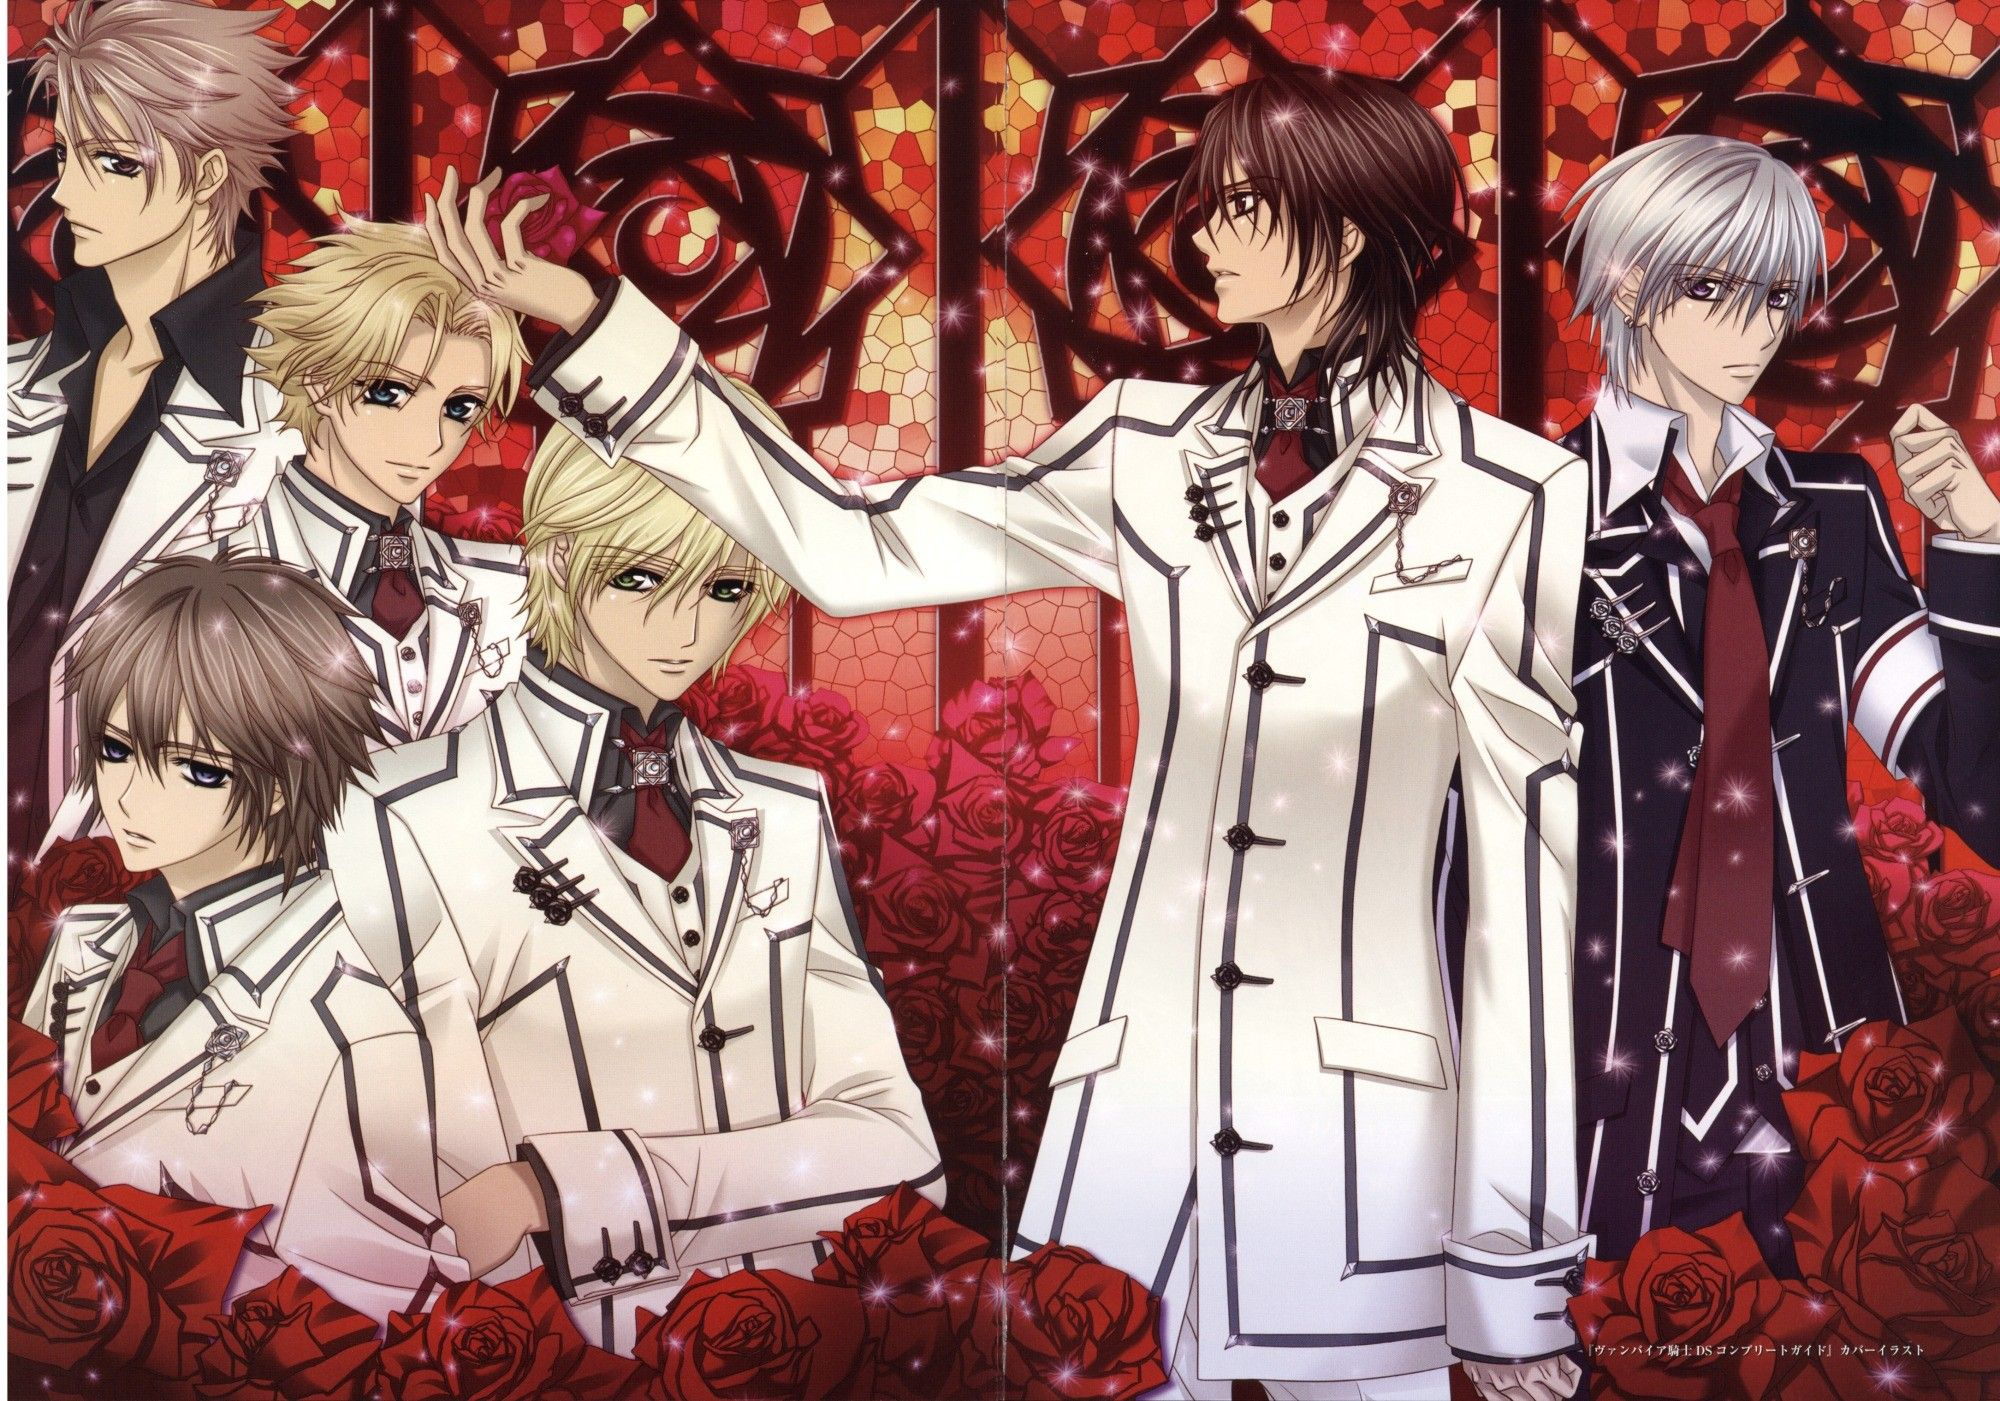 The Vampire Knight manga series and its Anime adaptation